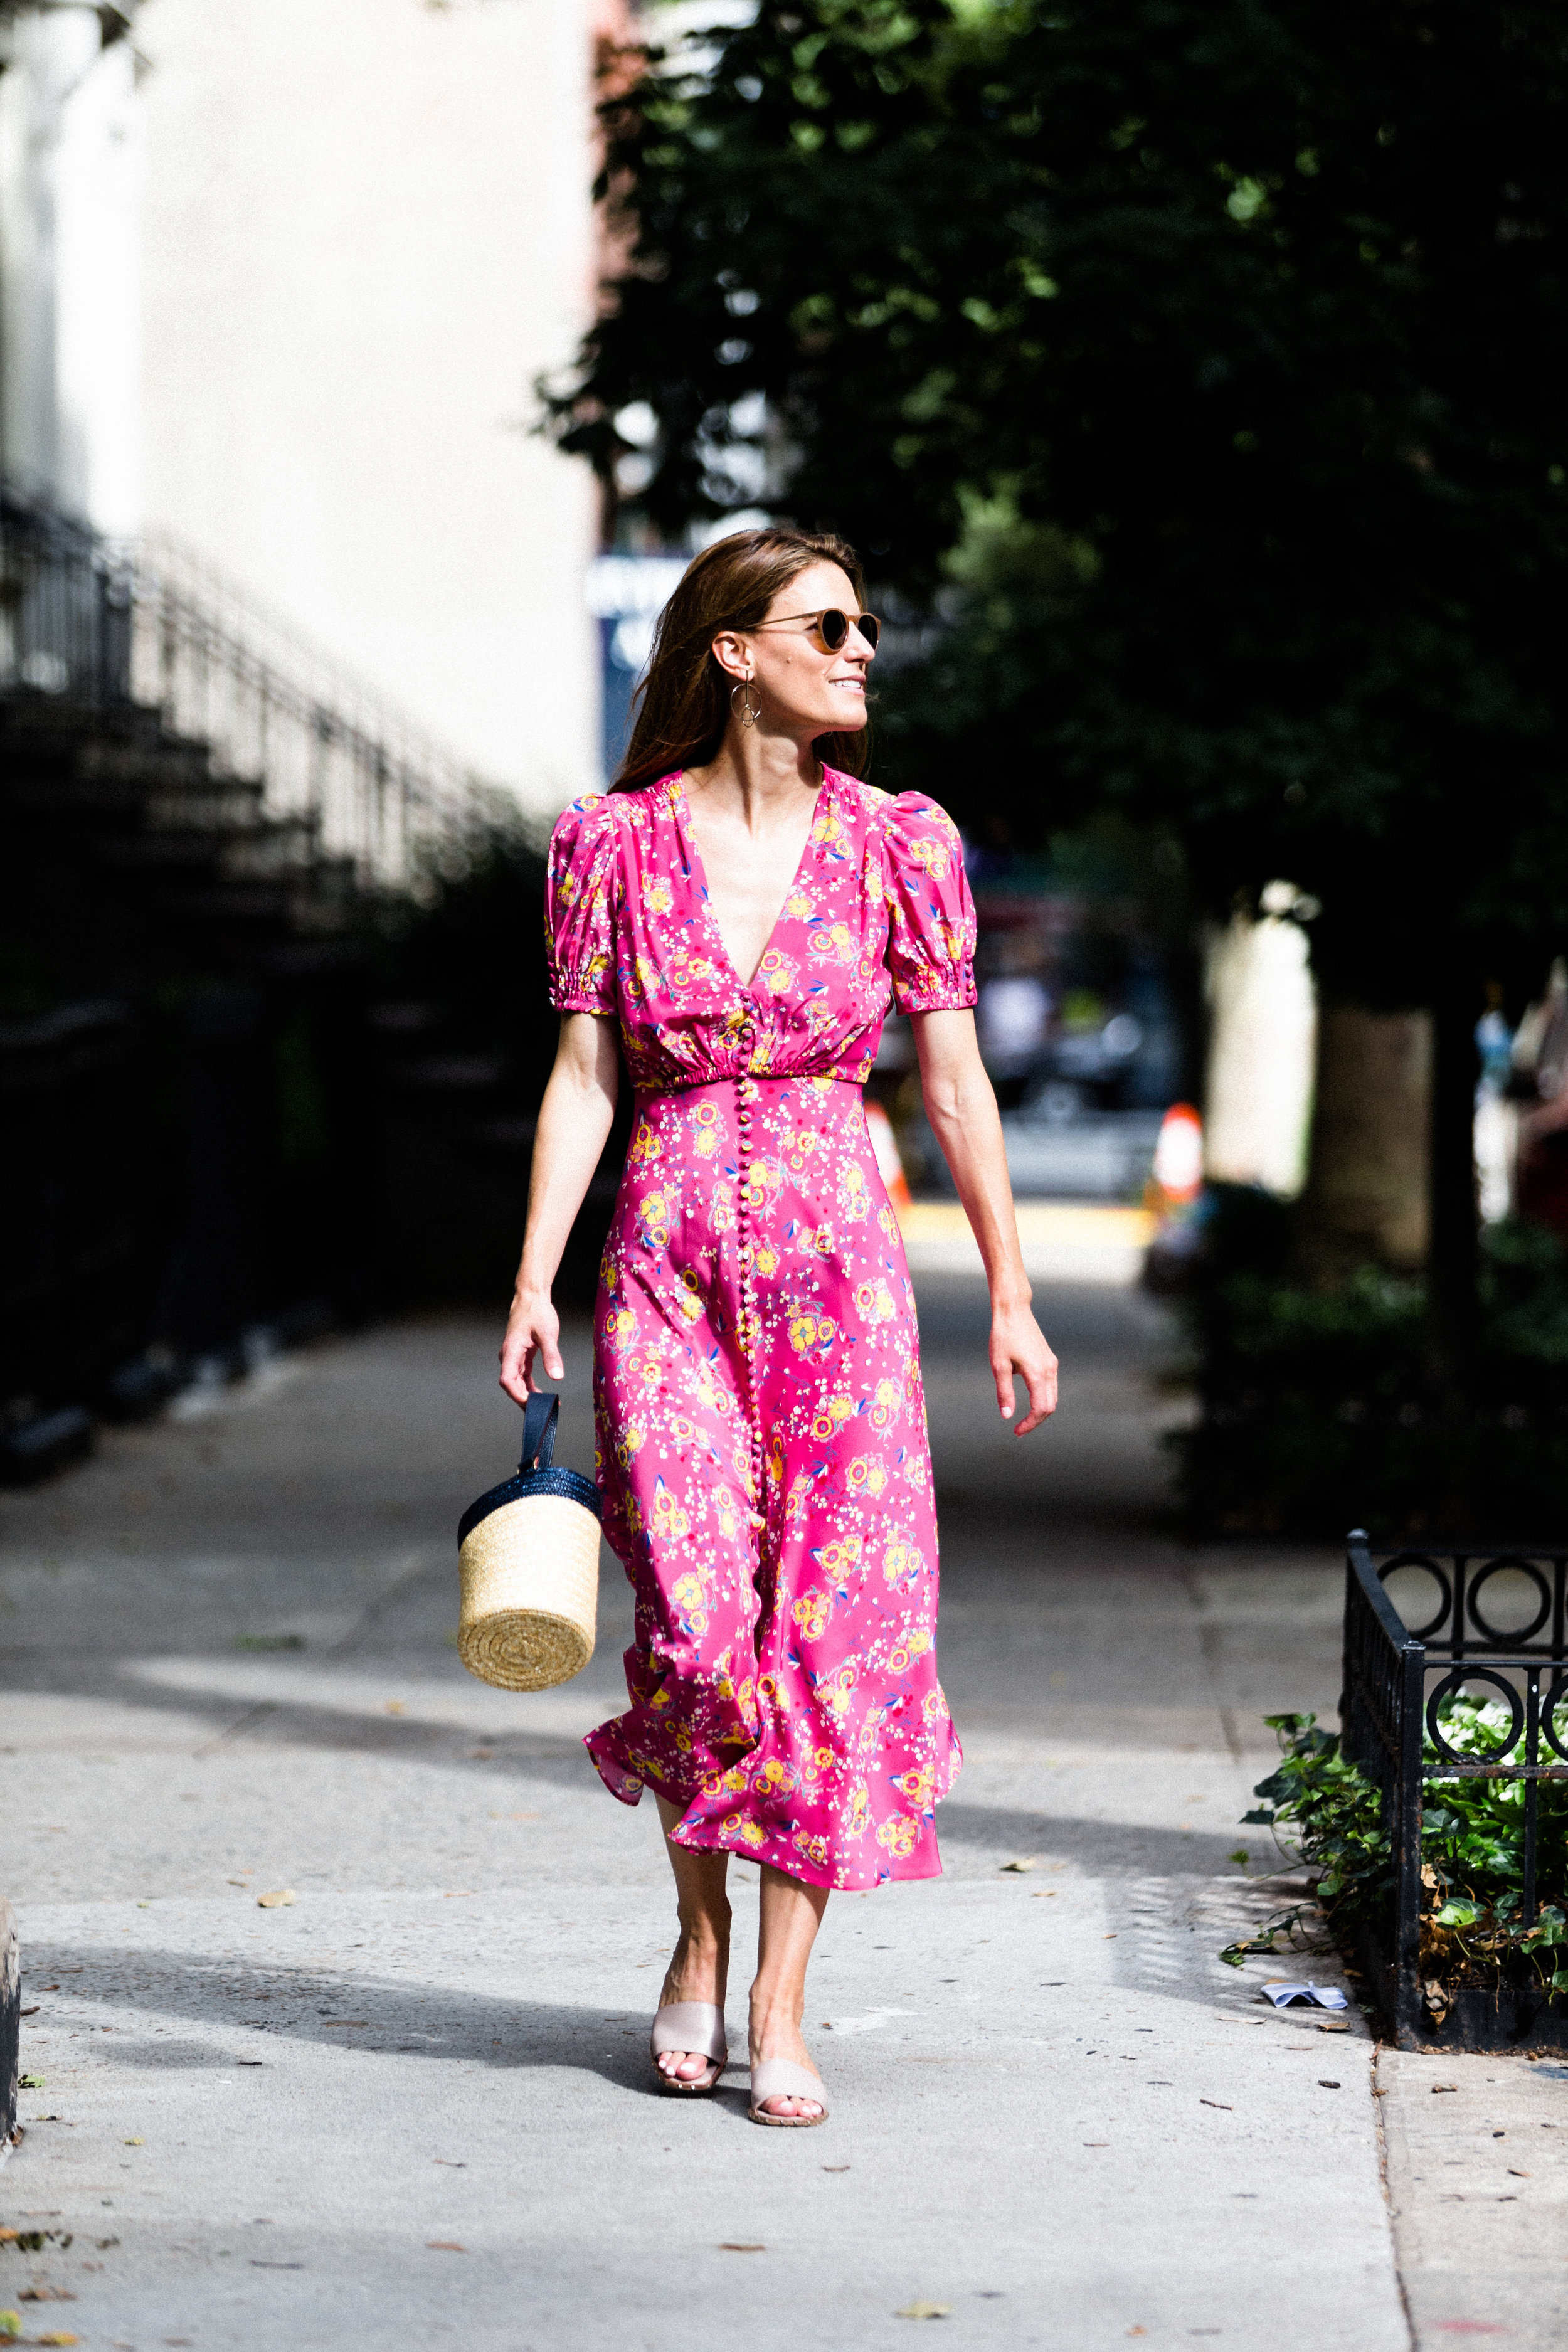 brooke-jaffe-dresses-4879 (1).jpg